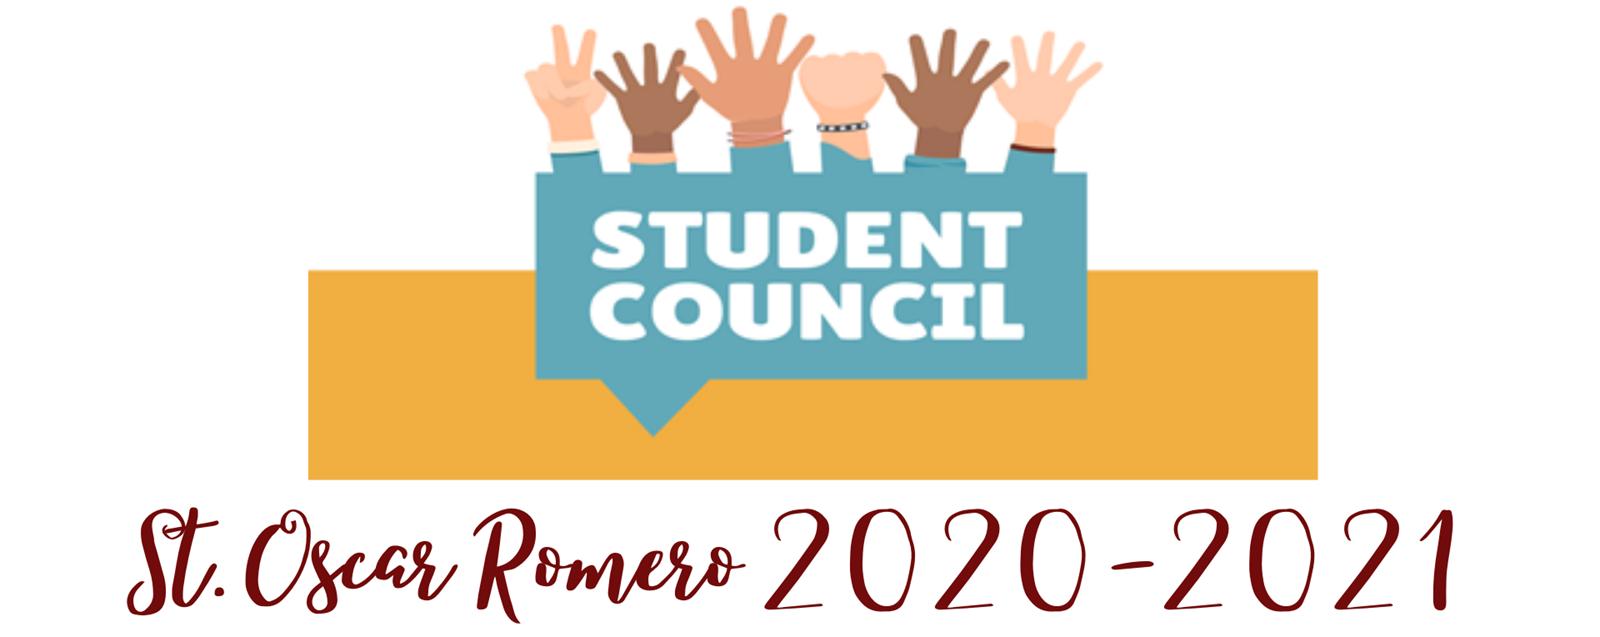 St. Oscar Romero 2020-2021.png